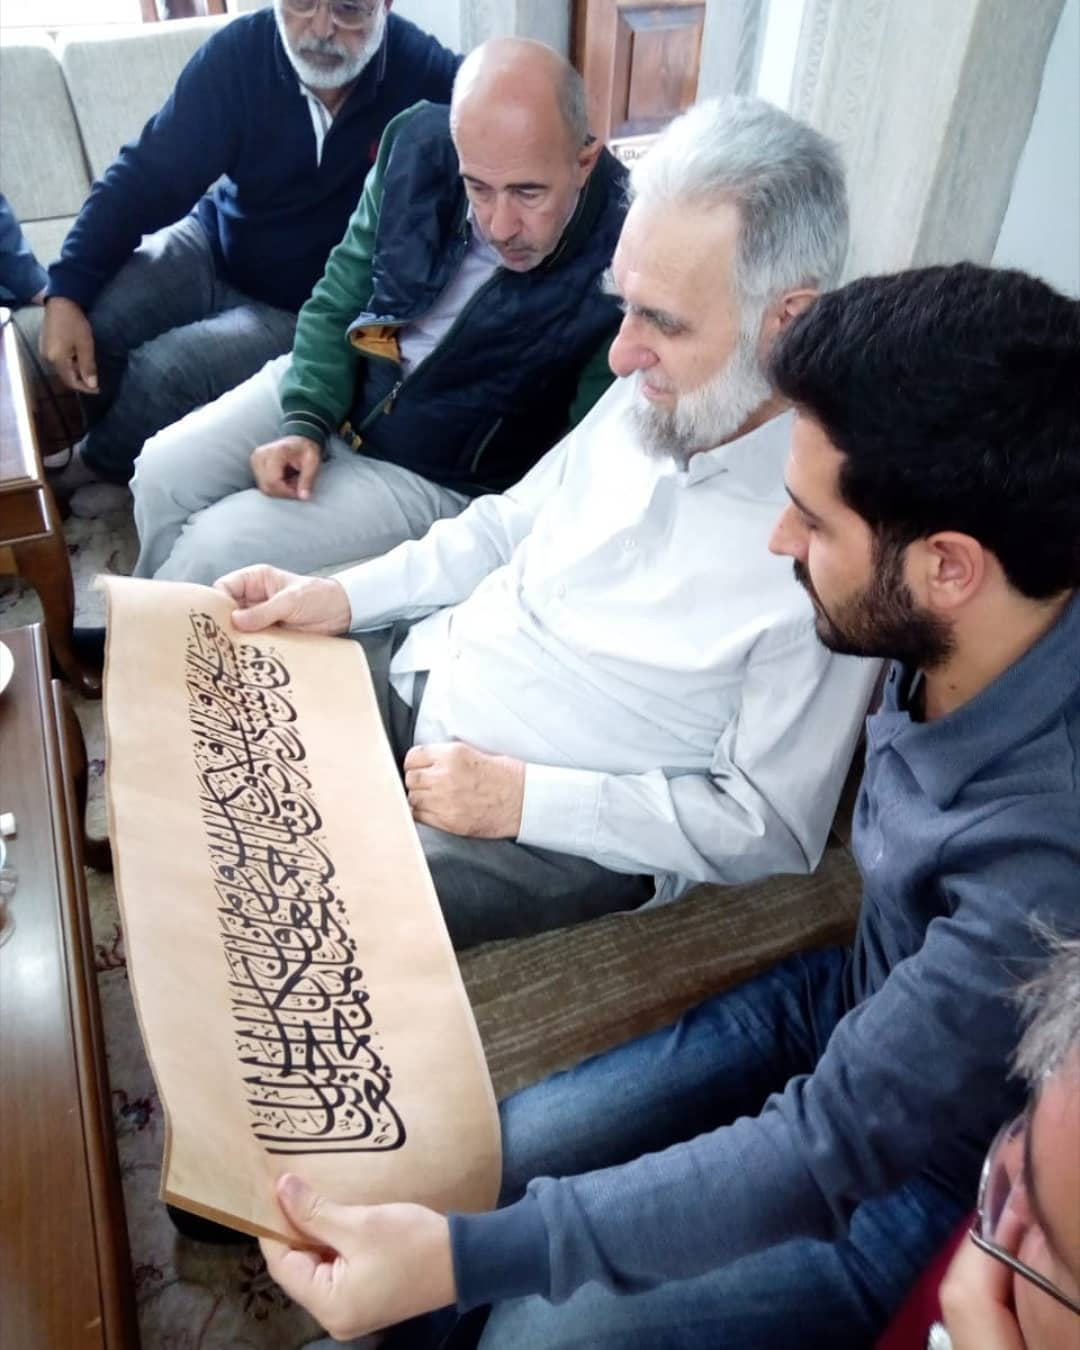 al kattat احمدعلی نمازی  . . . . . .#islamic #islamicart #artwork #calligraphy #hüsnühat #hattat #sülüs #… 472